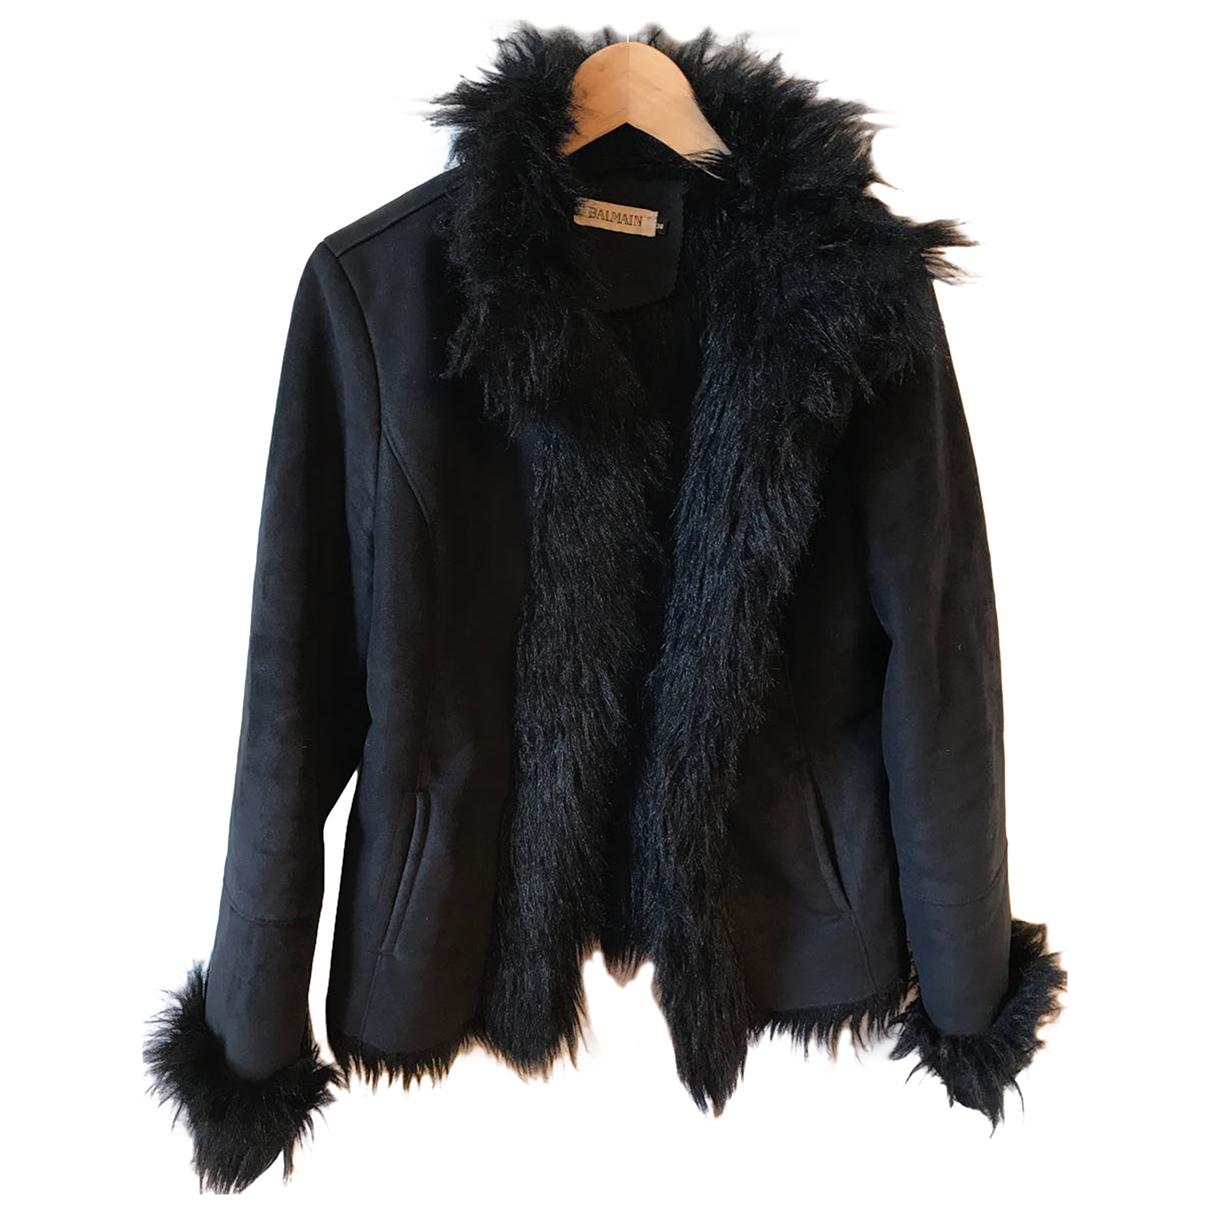 Balmain \N Black Faux fur coat for Women 38 FR